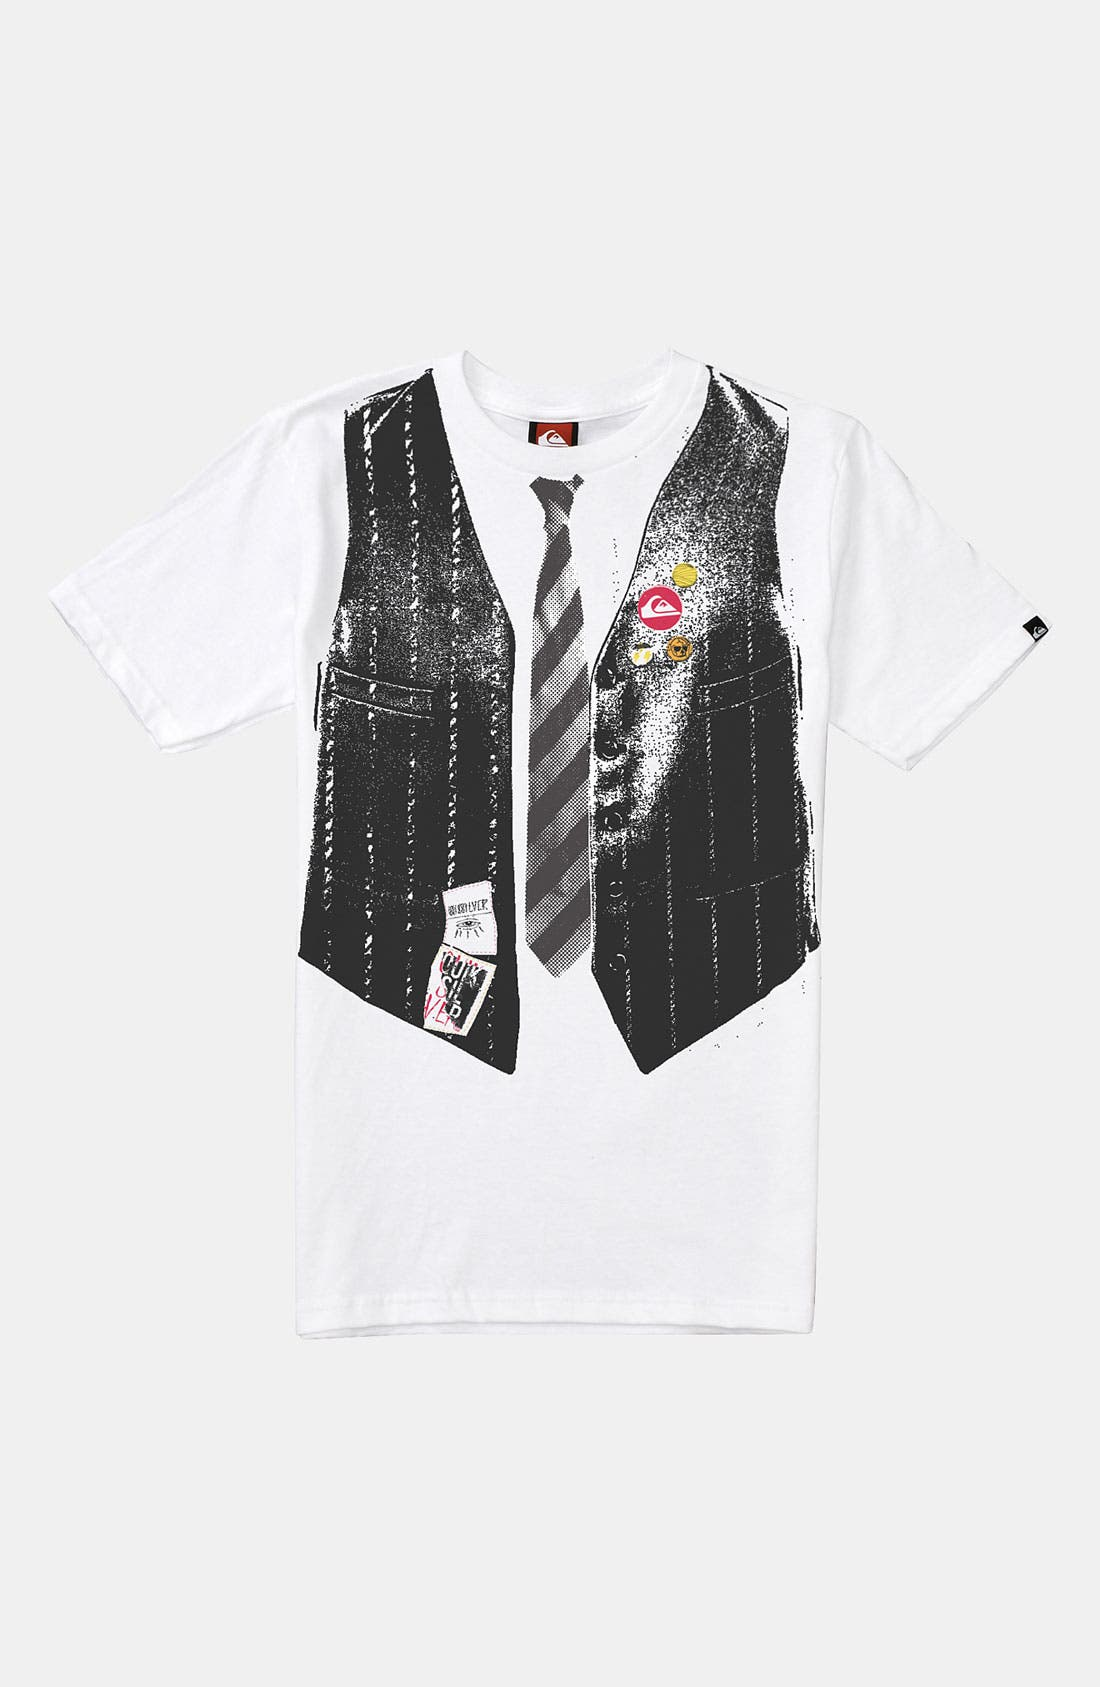 Main Image - Quiksilver 'Big Night Out' Screenprint T-Shirt (Big Boys)